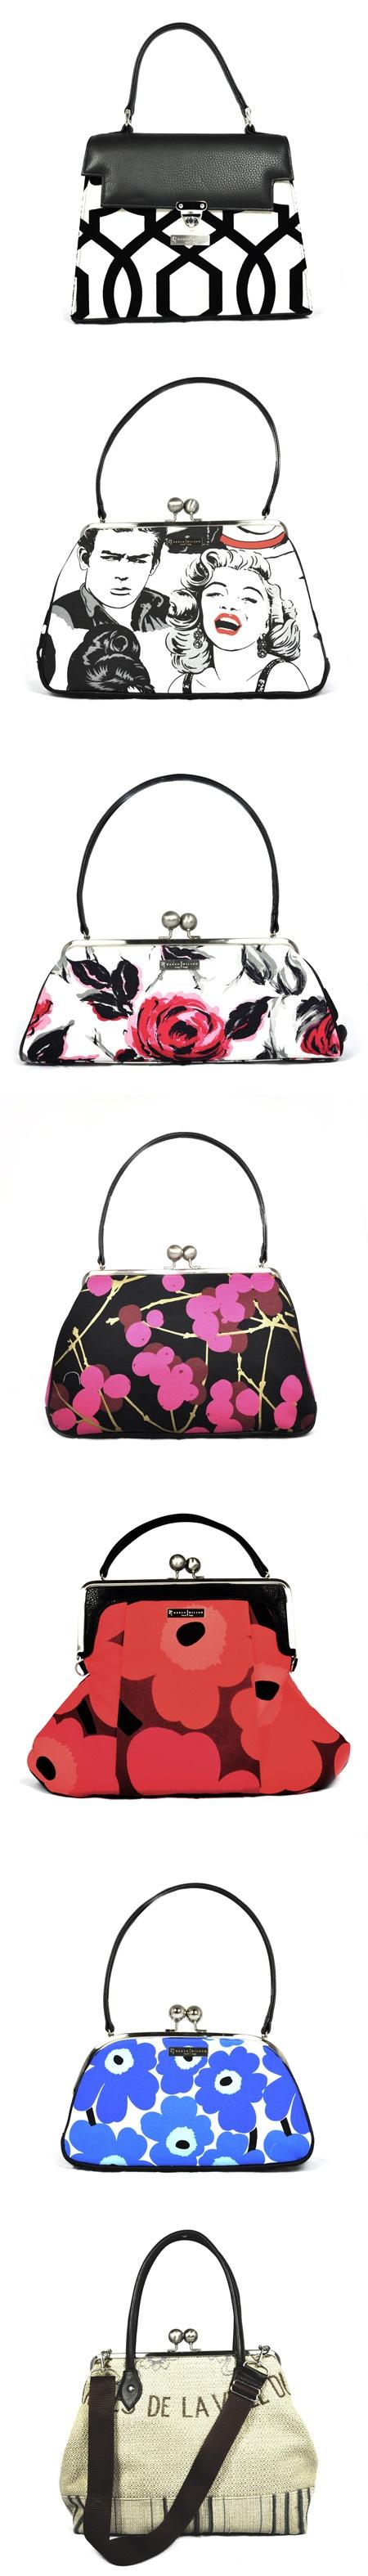 Hand Bags from Karen Wilson's 2012 Collection